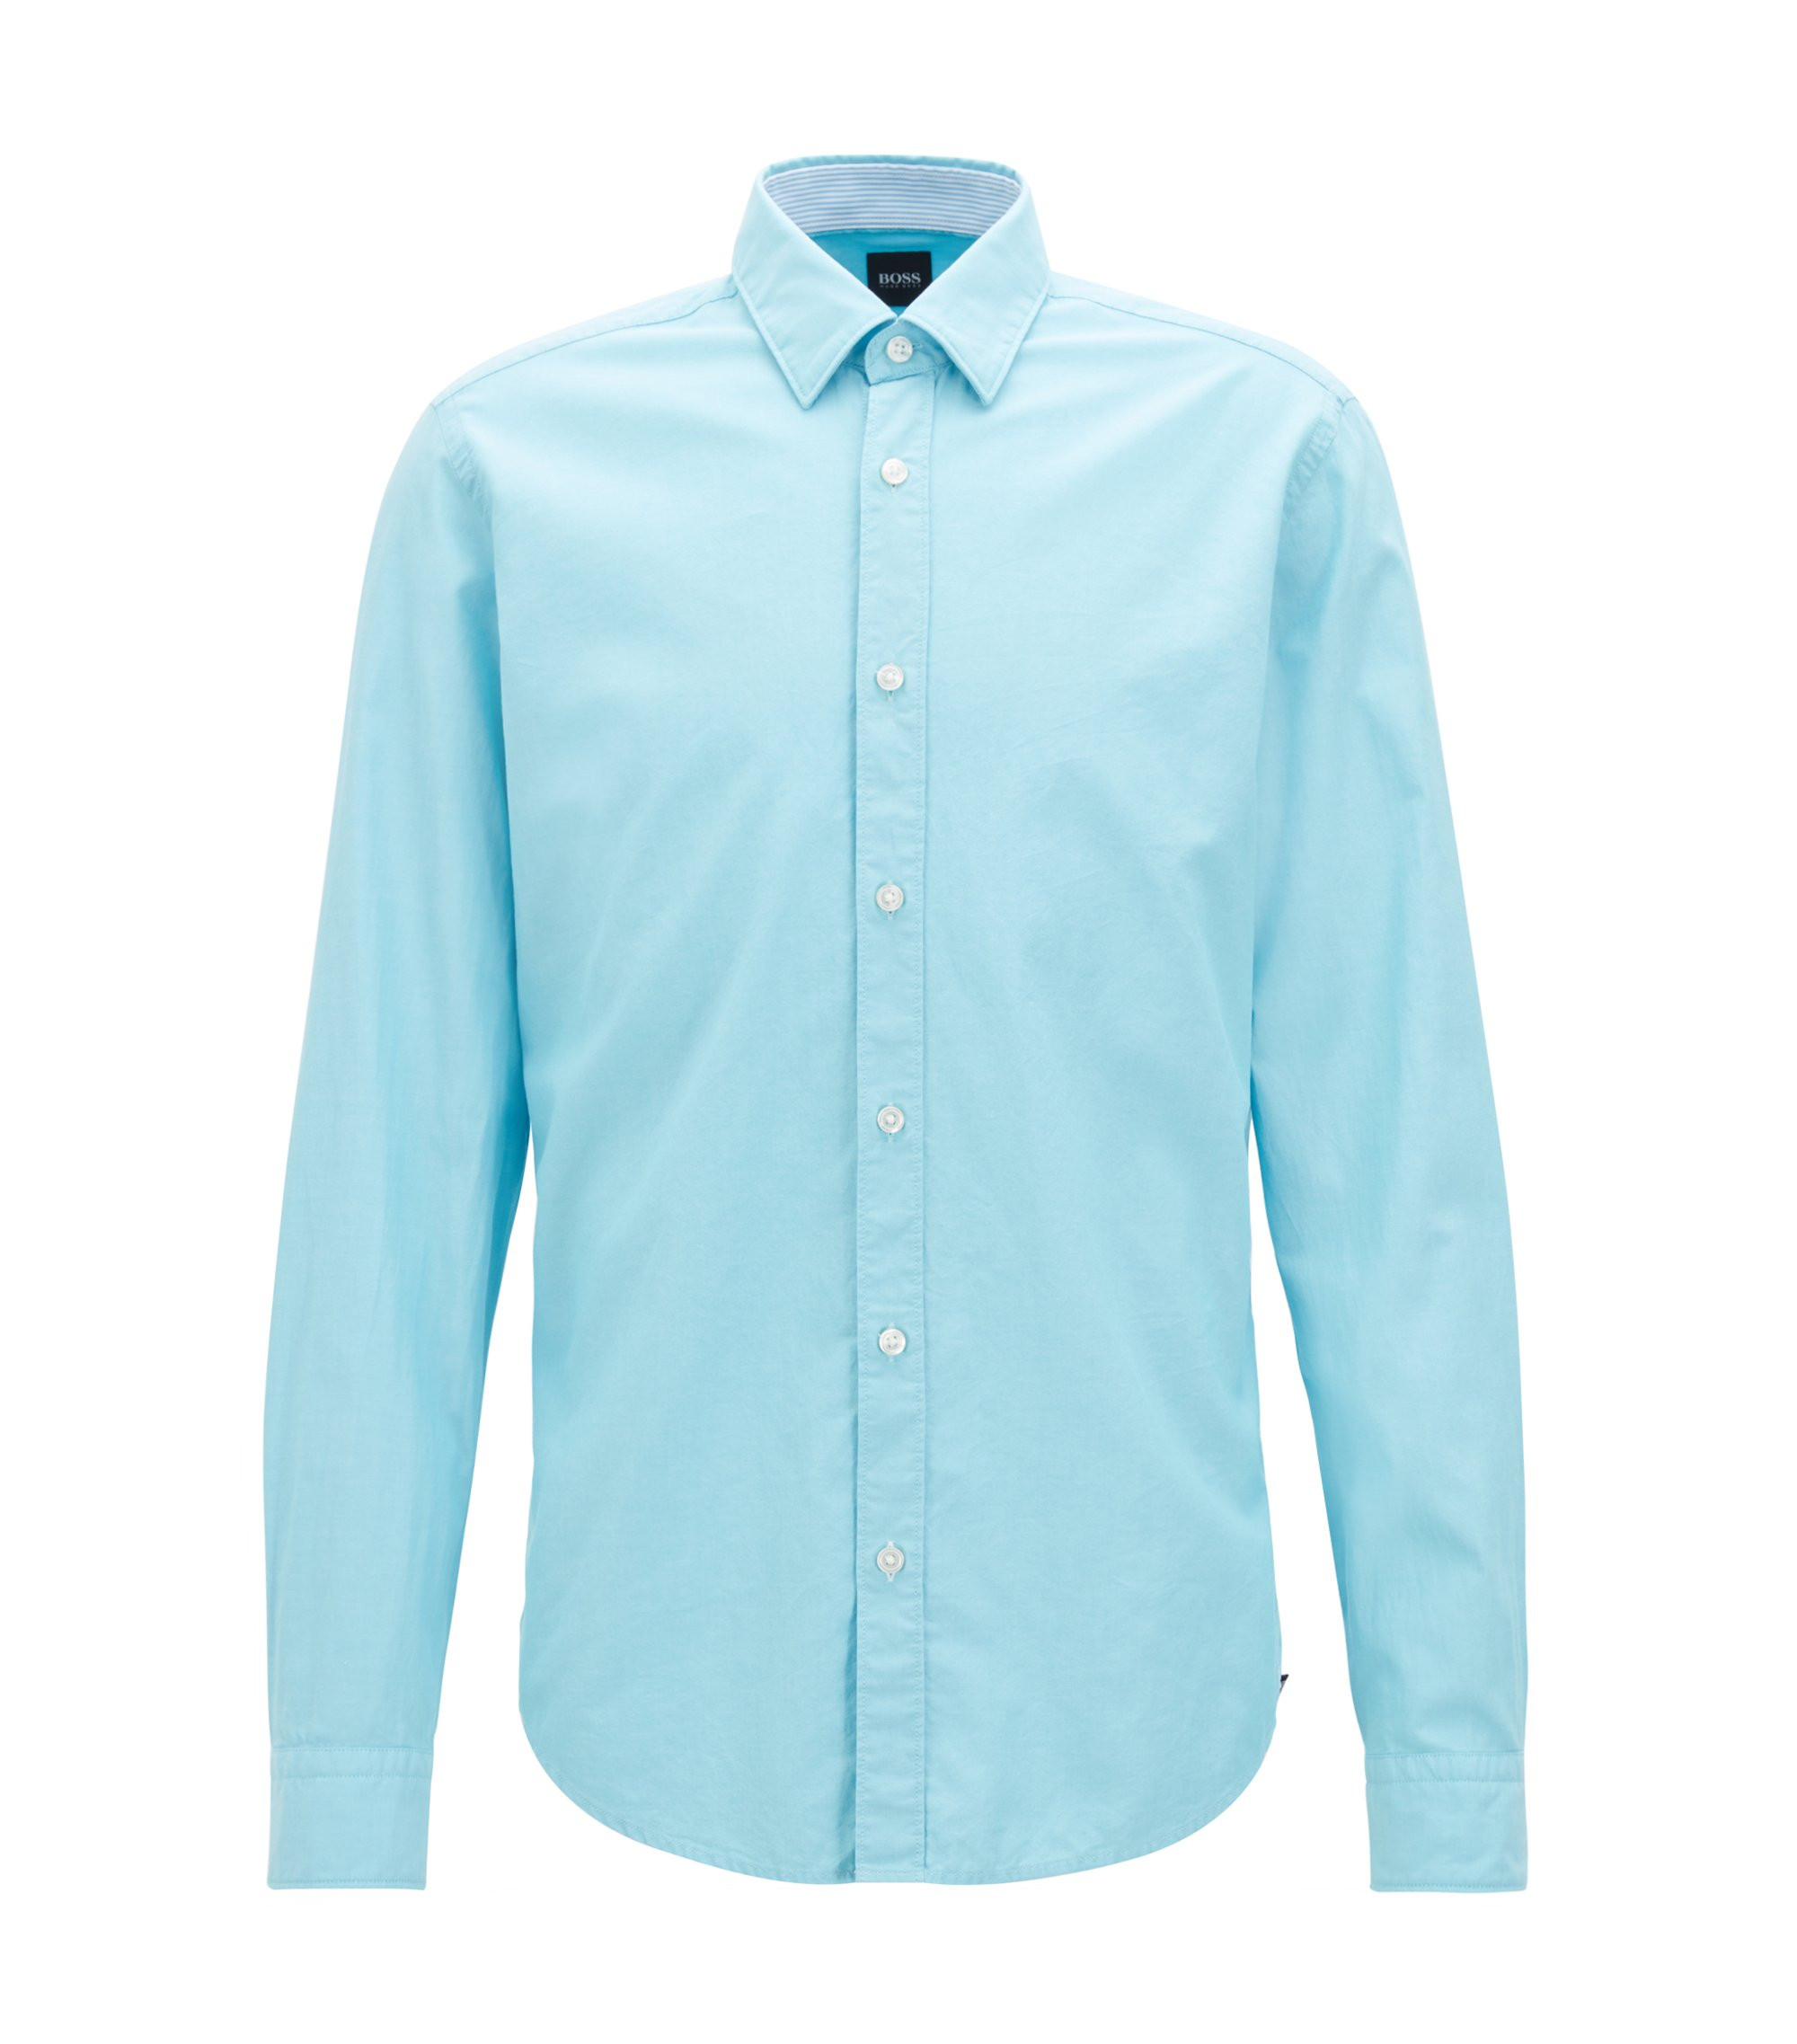 Slim-Fit Oxford-Hemd aus merzerisierter Baumwolle, Hellblau